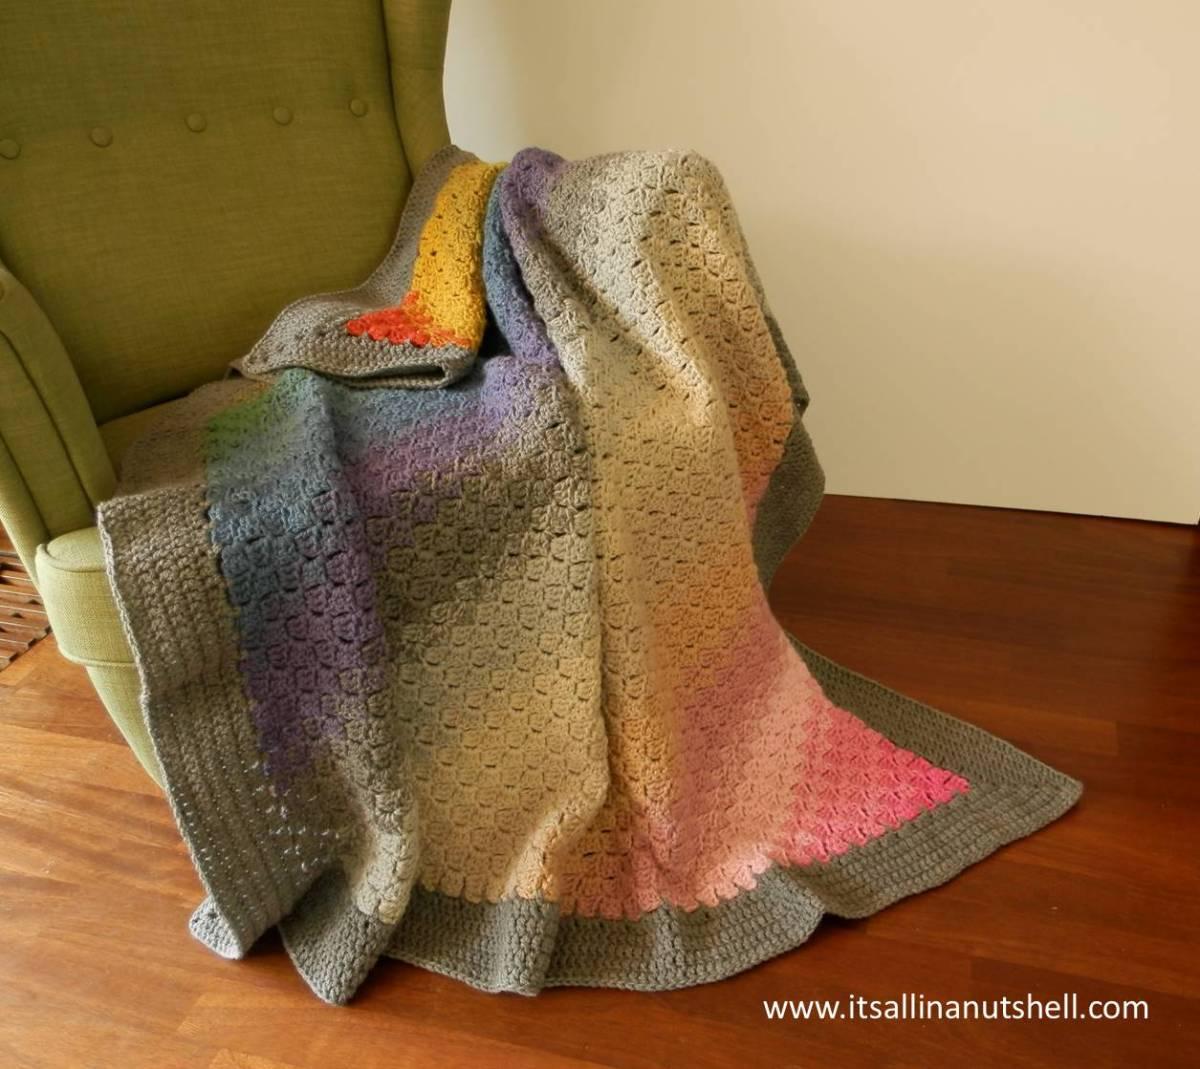 Spectrum C2C Ombre Blanket - Free Crochet Pattern